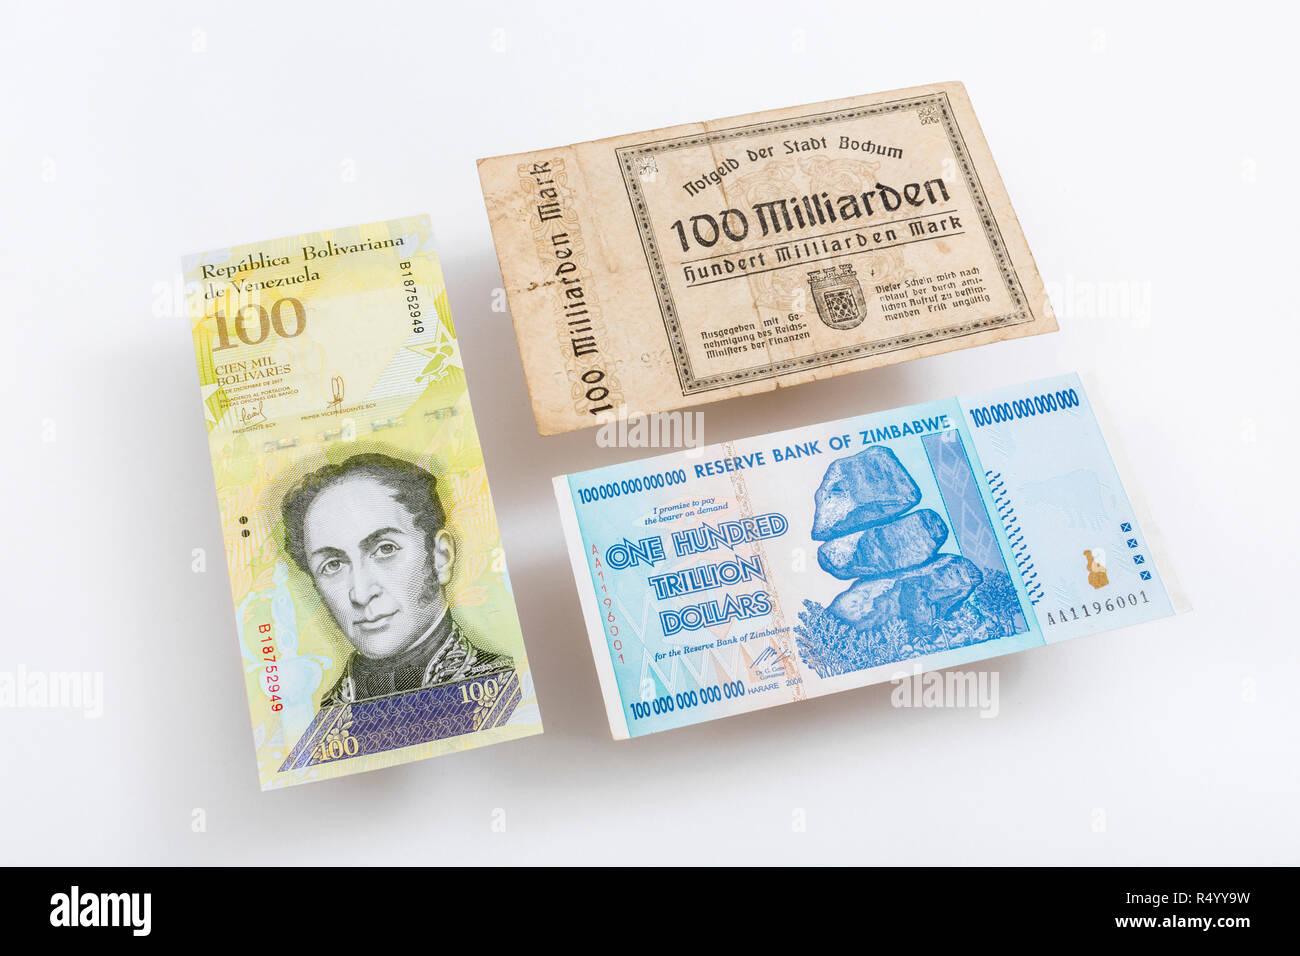 5 Million German Marks 1923 Banknote 1 Million Zimbabwe Dollars 2008 Currency